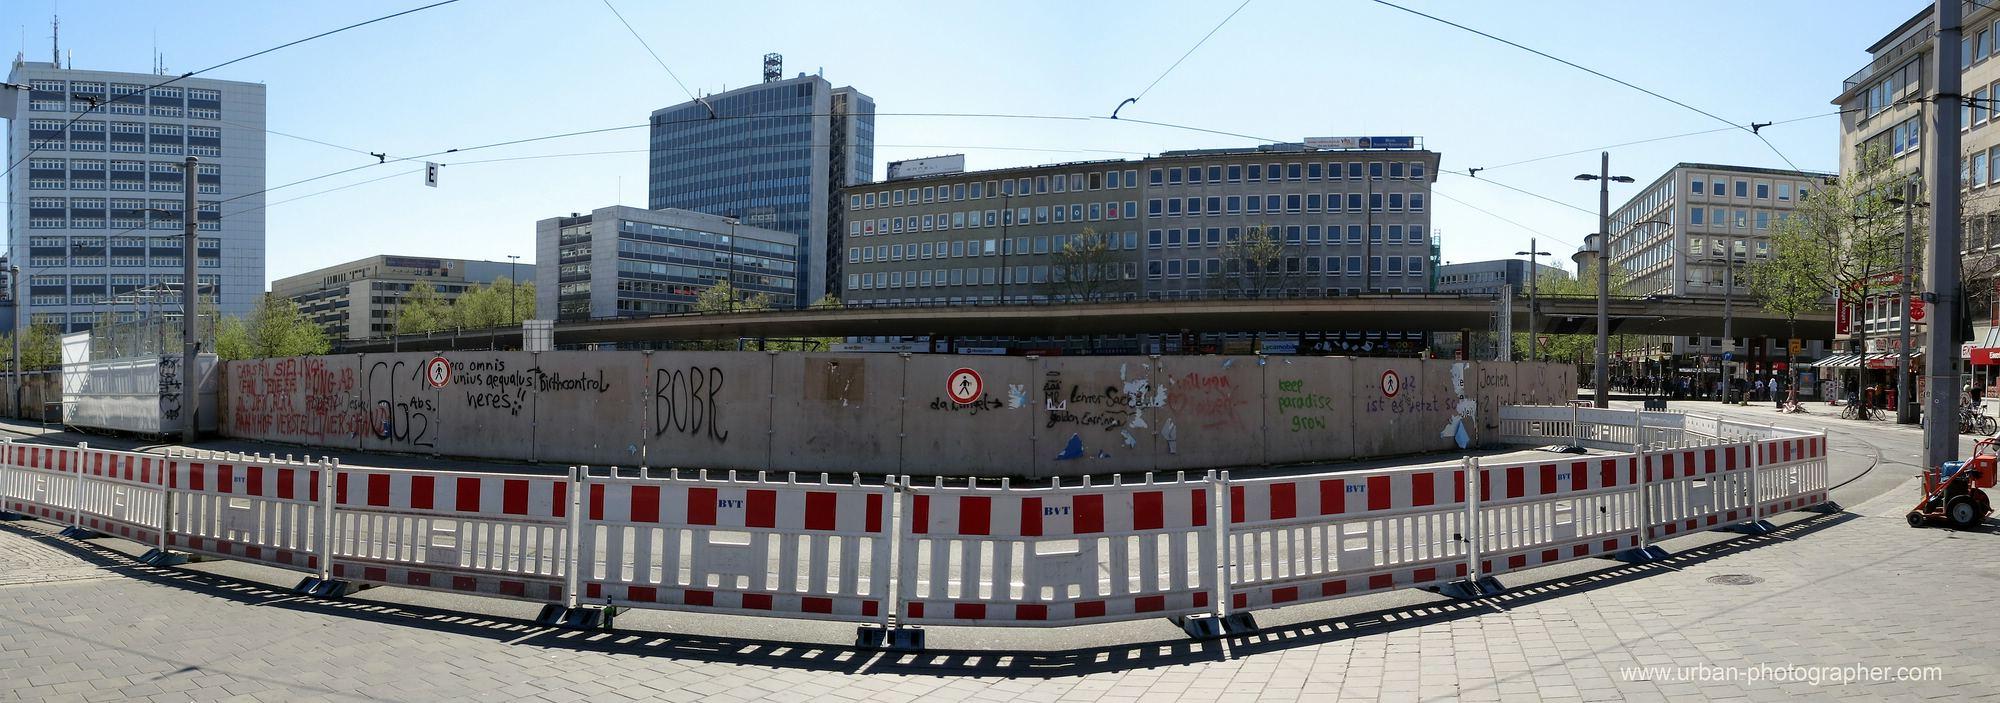 Baustelle Bahnhofsplatz 52